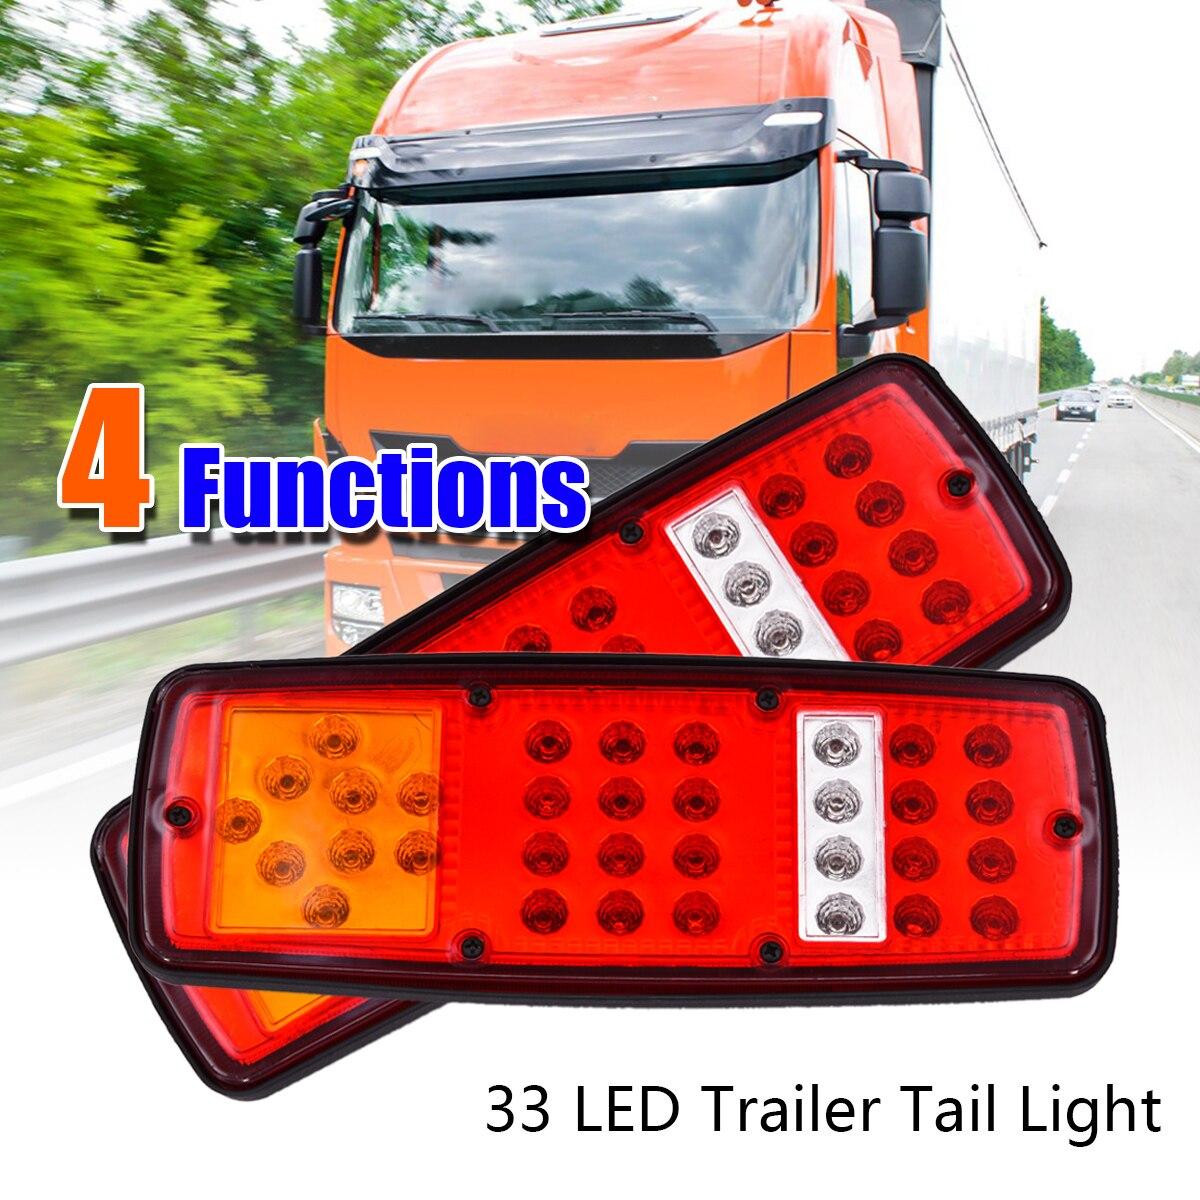 2pcs Rear Tail Lights 27.6*10.3cm 12V Truck Trailer Boat 33 LED Lamp Kit Tail Light Stop Indicator Waterproof